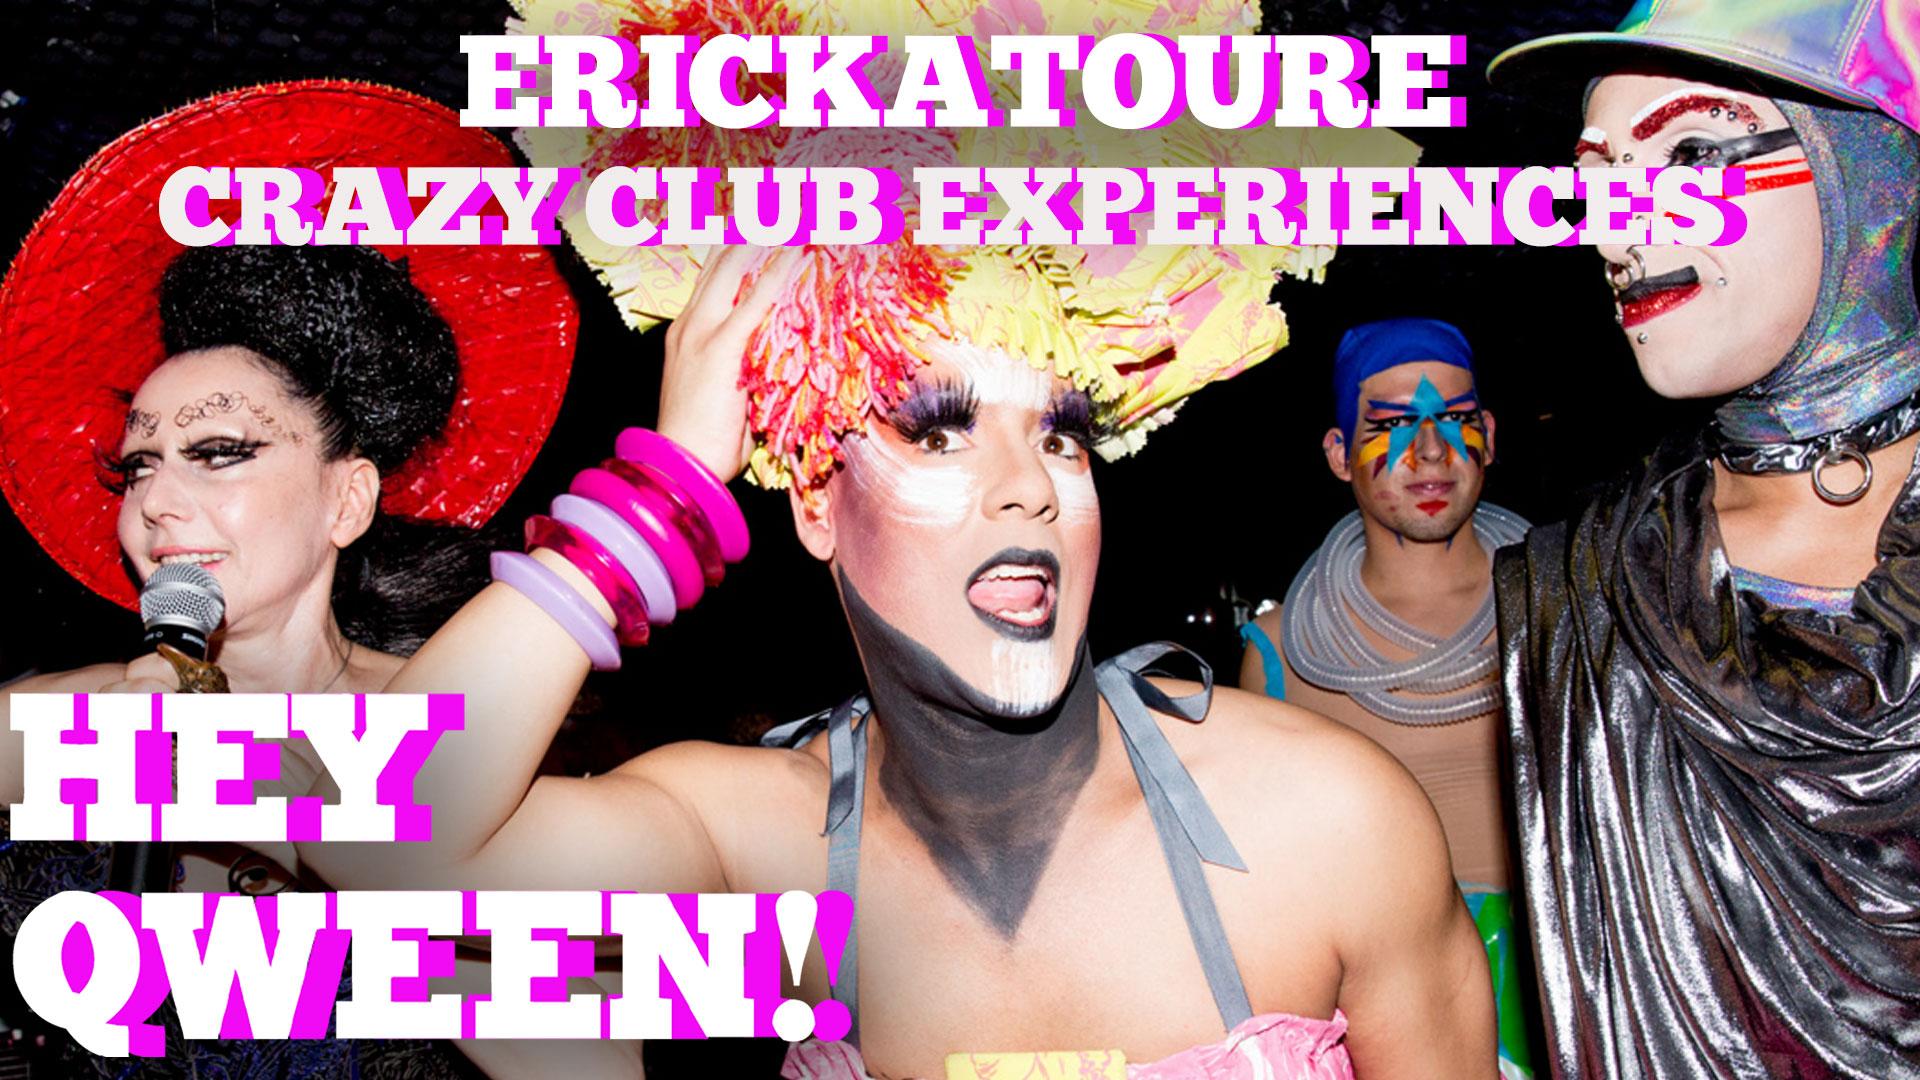 Erickatoure's Craziest Club Experience Ever: Hey Qween! BONUS